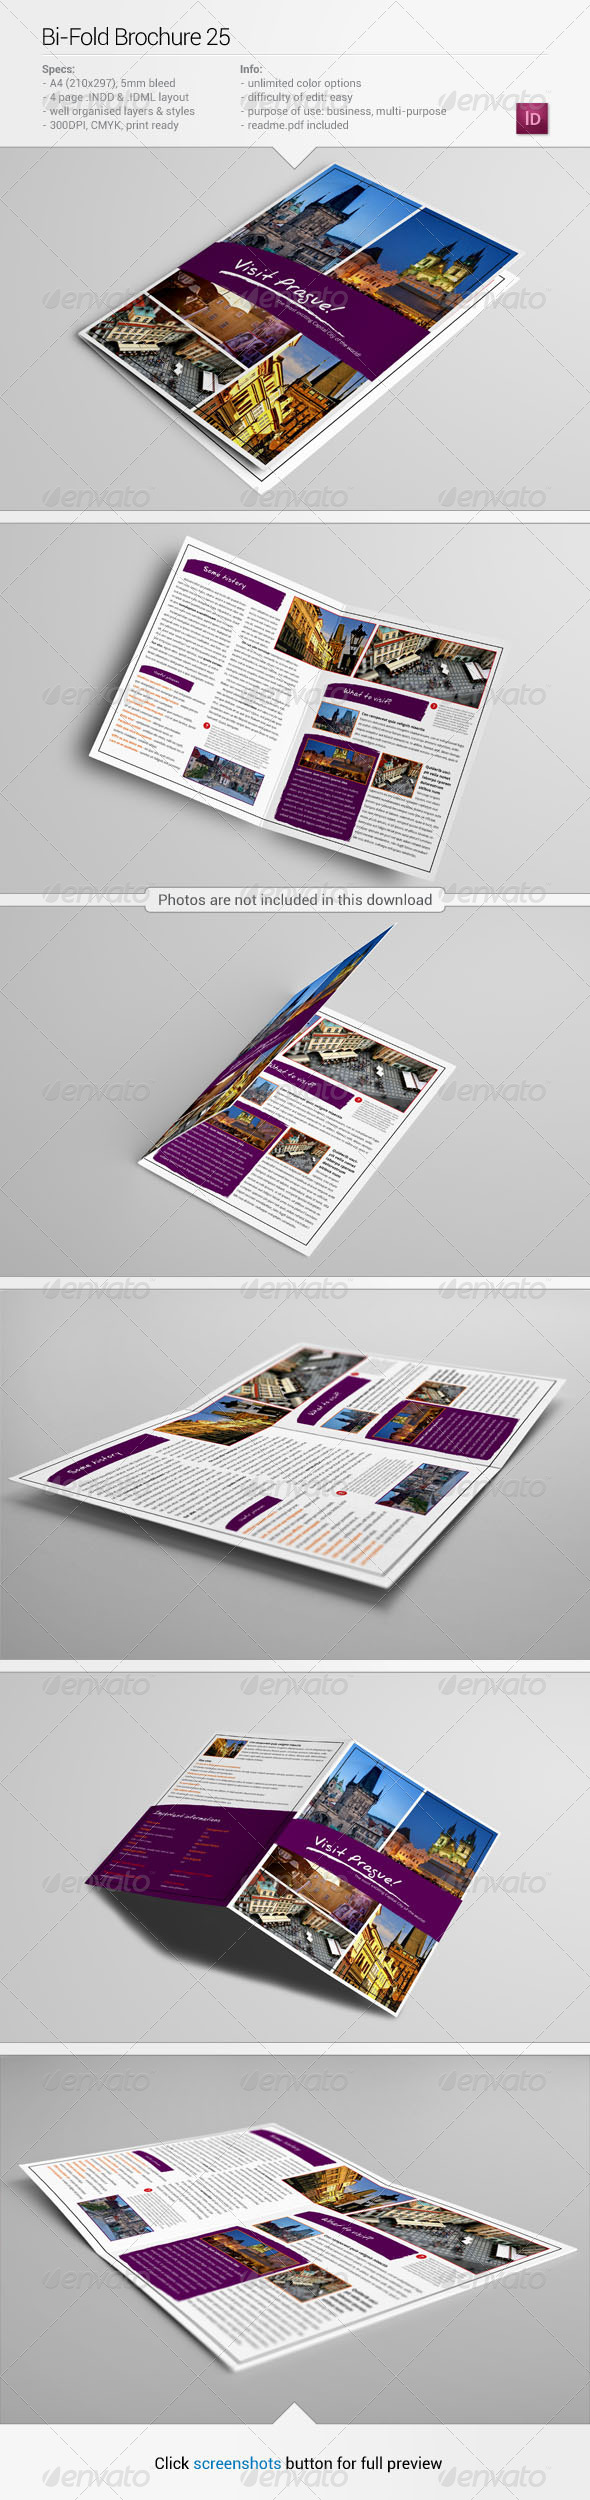 GraphicRiver Bi-Fold Brochure 25 5779702